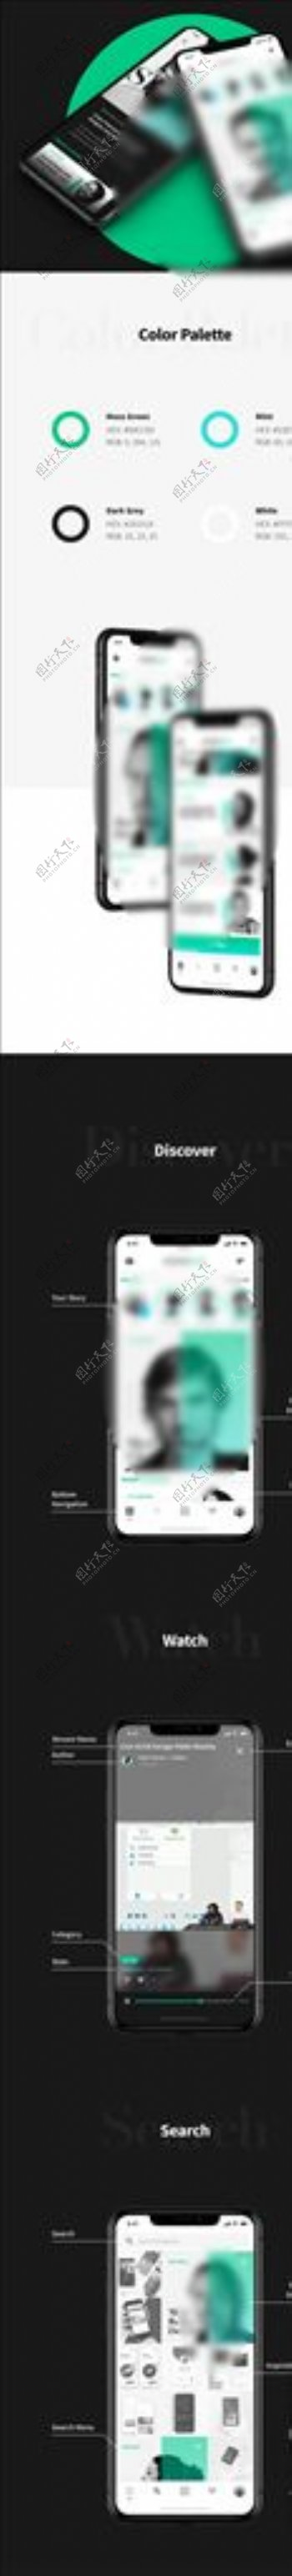 xd社交绿色UI设计首页播放页图片